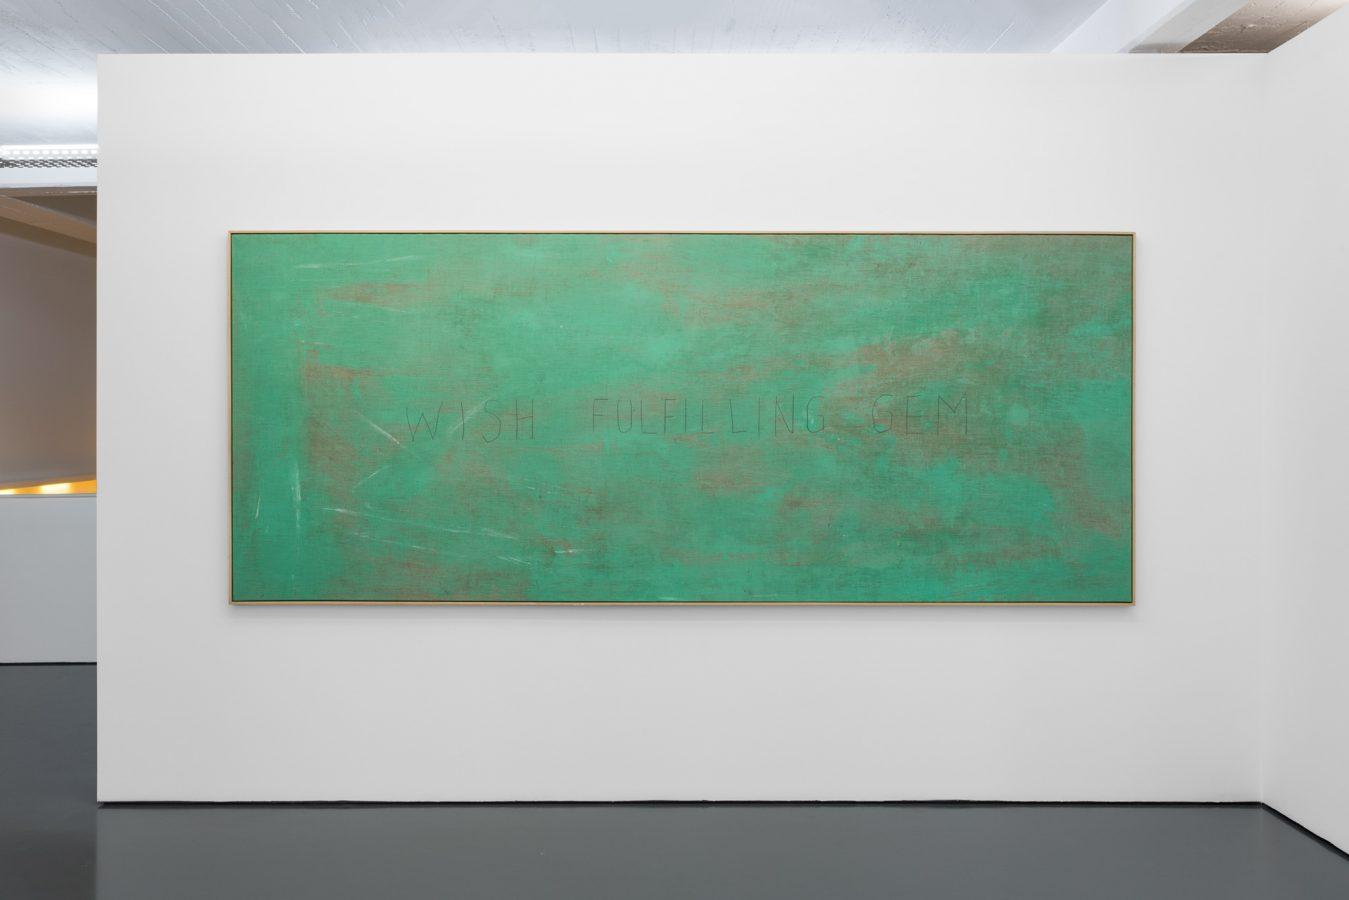 Galeria Pedro Cera – Vítor Pomar - apparent but nonexistent